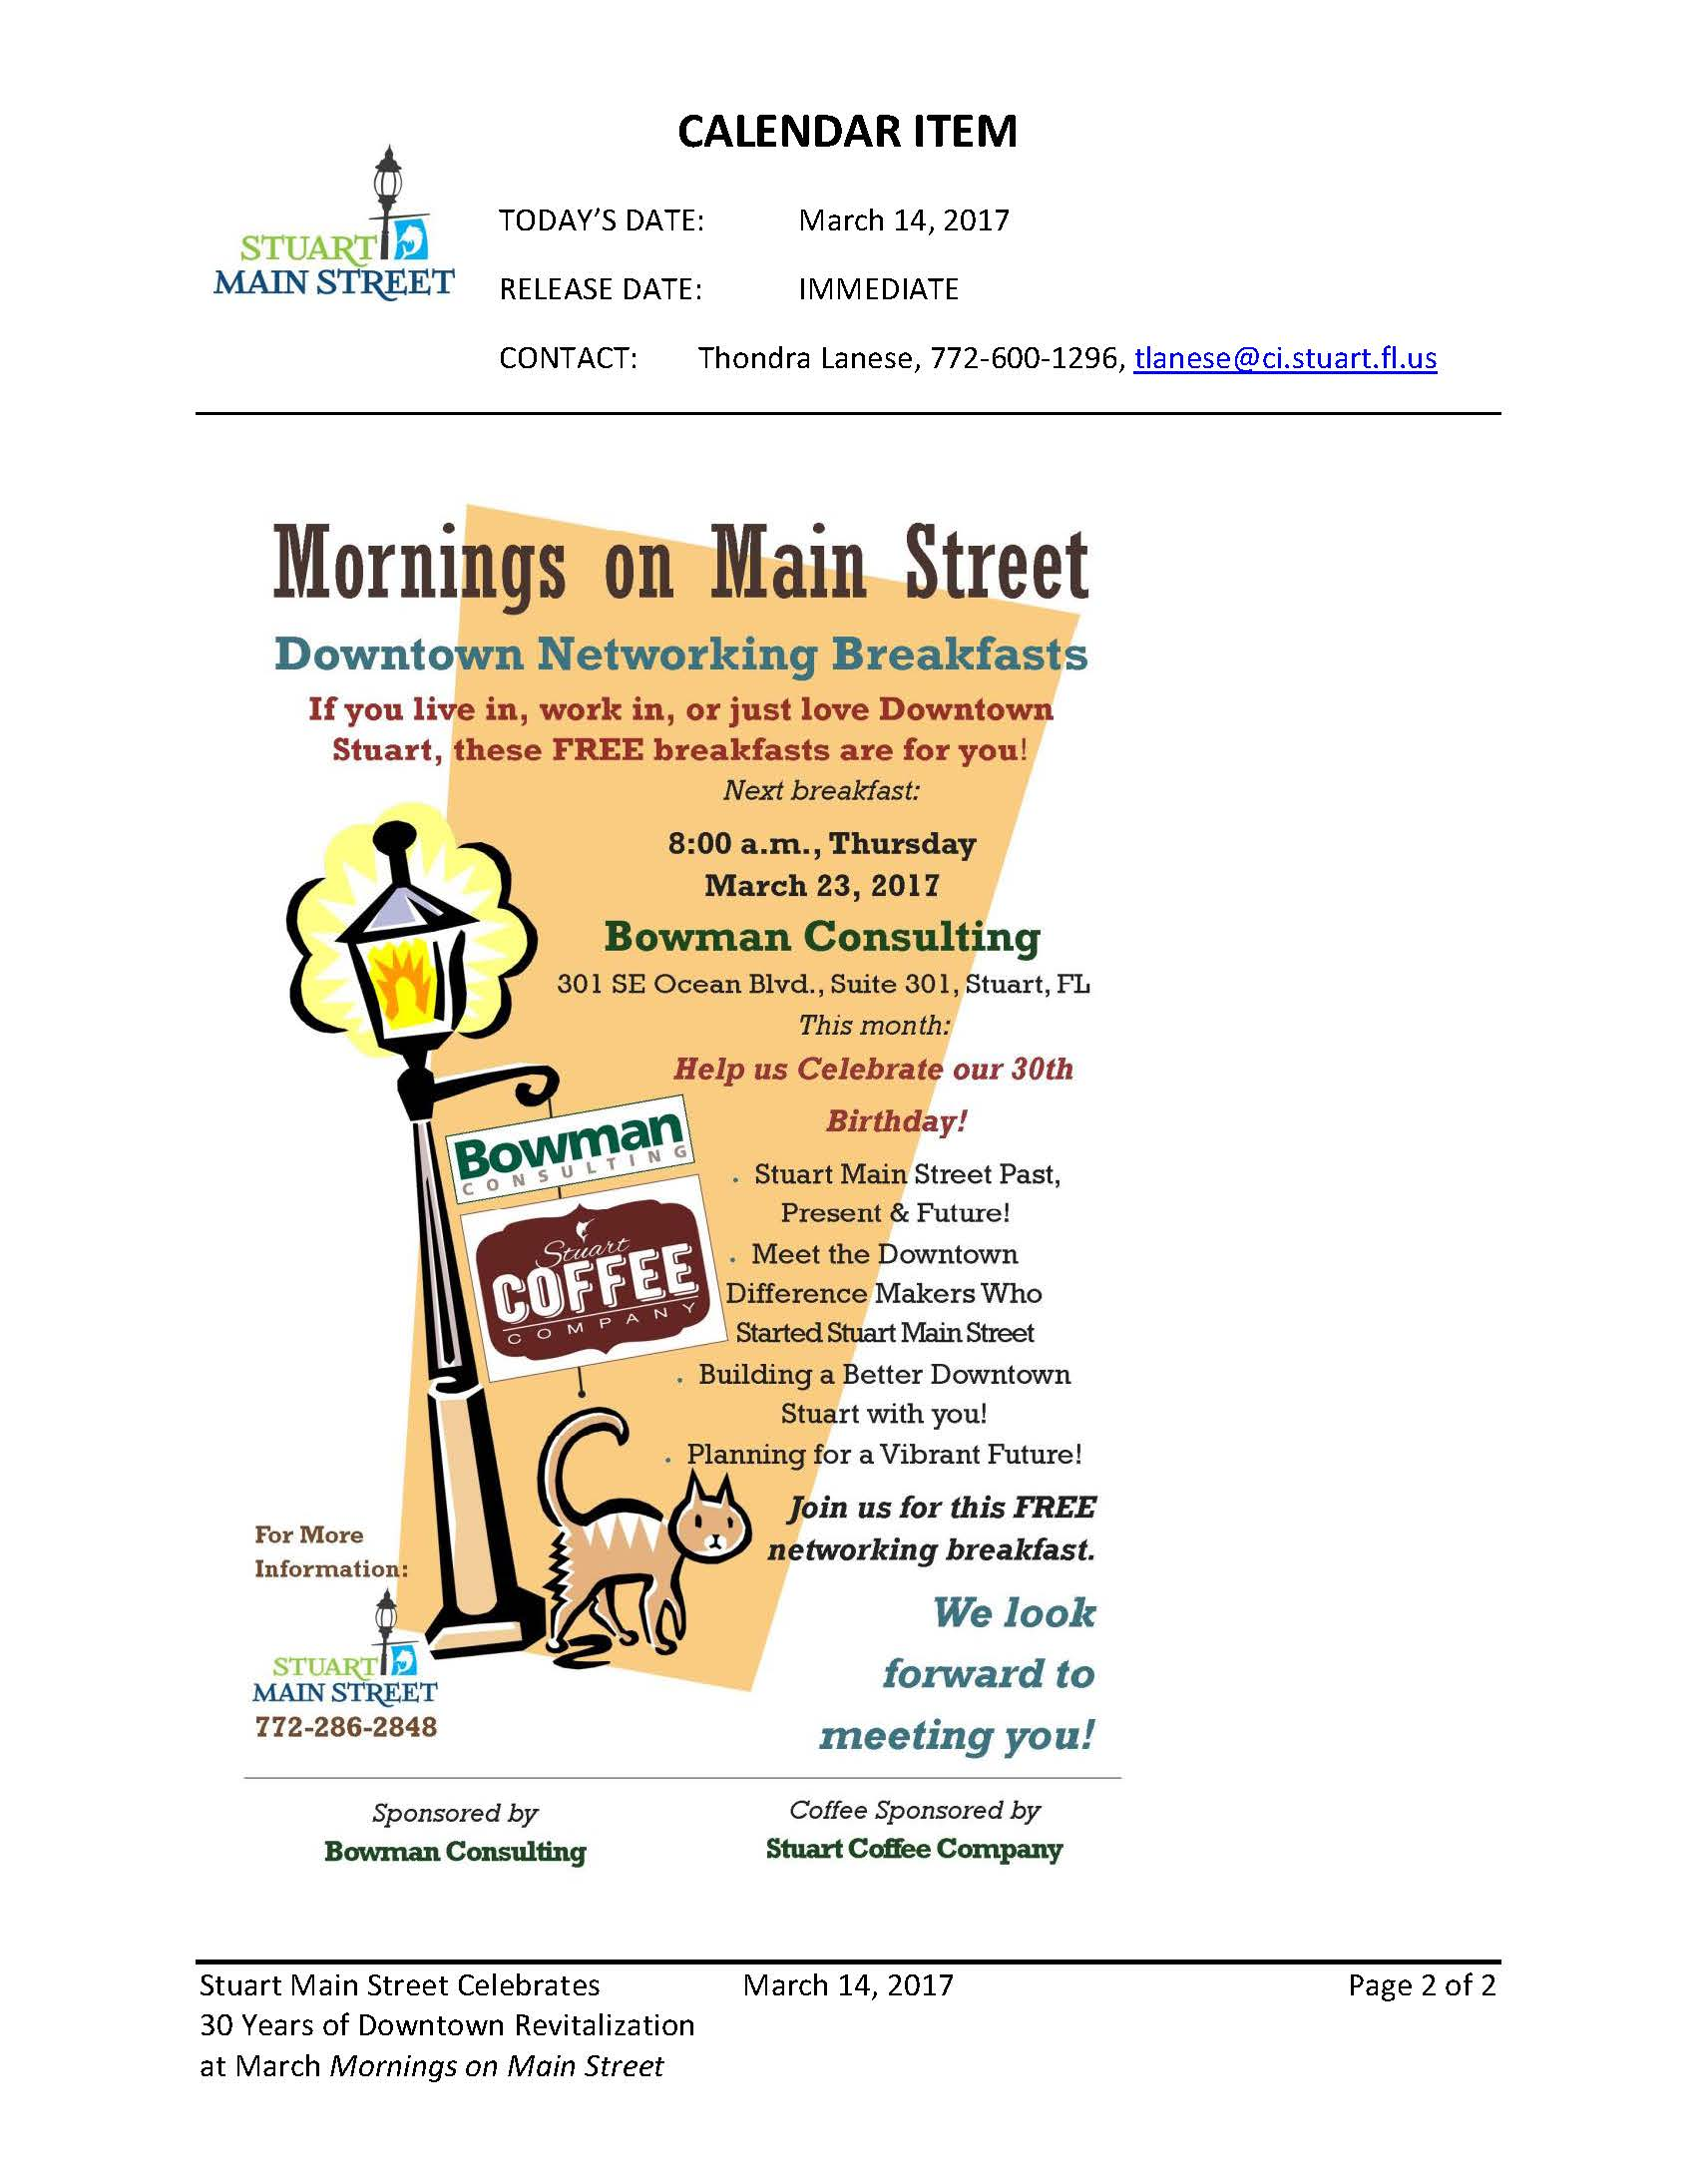 Mornings on Main Street